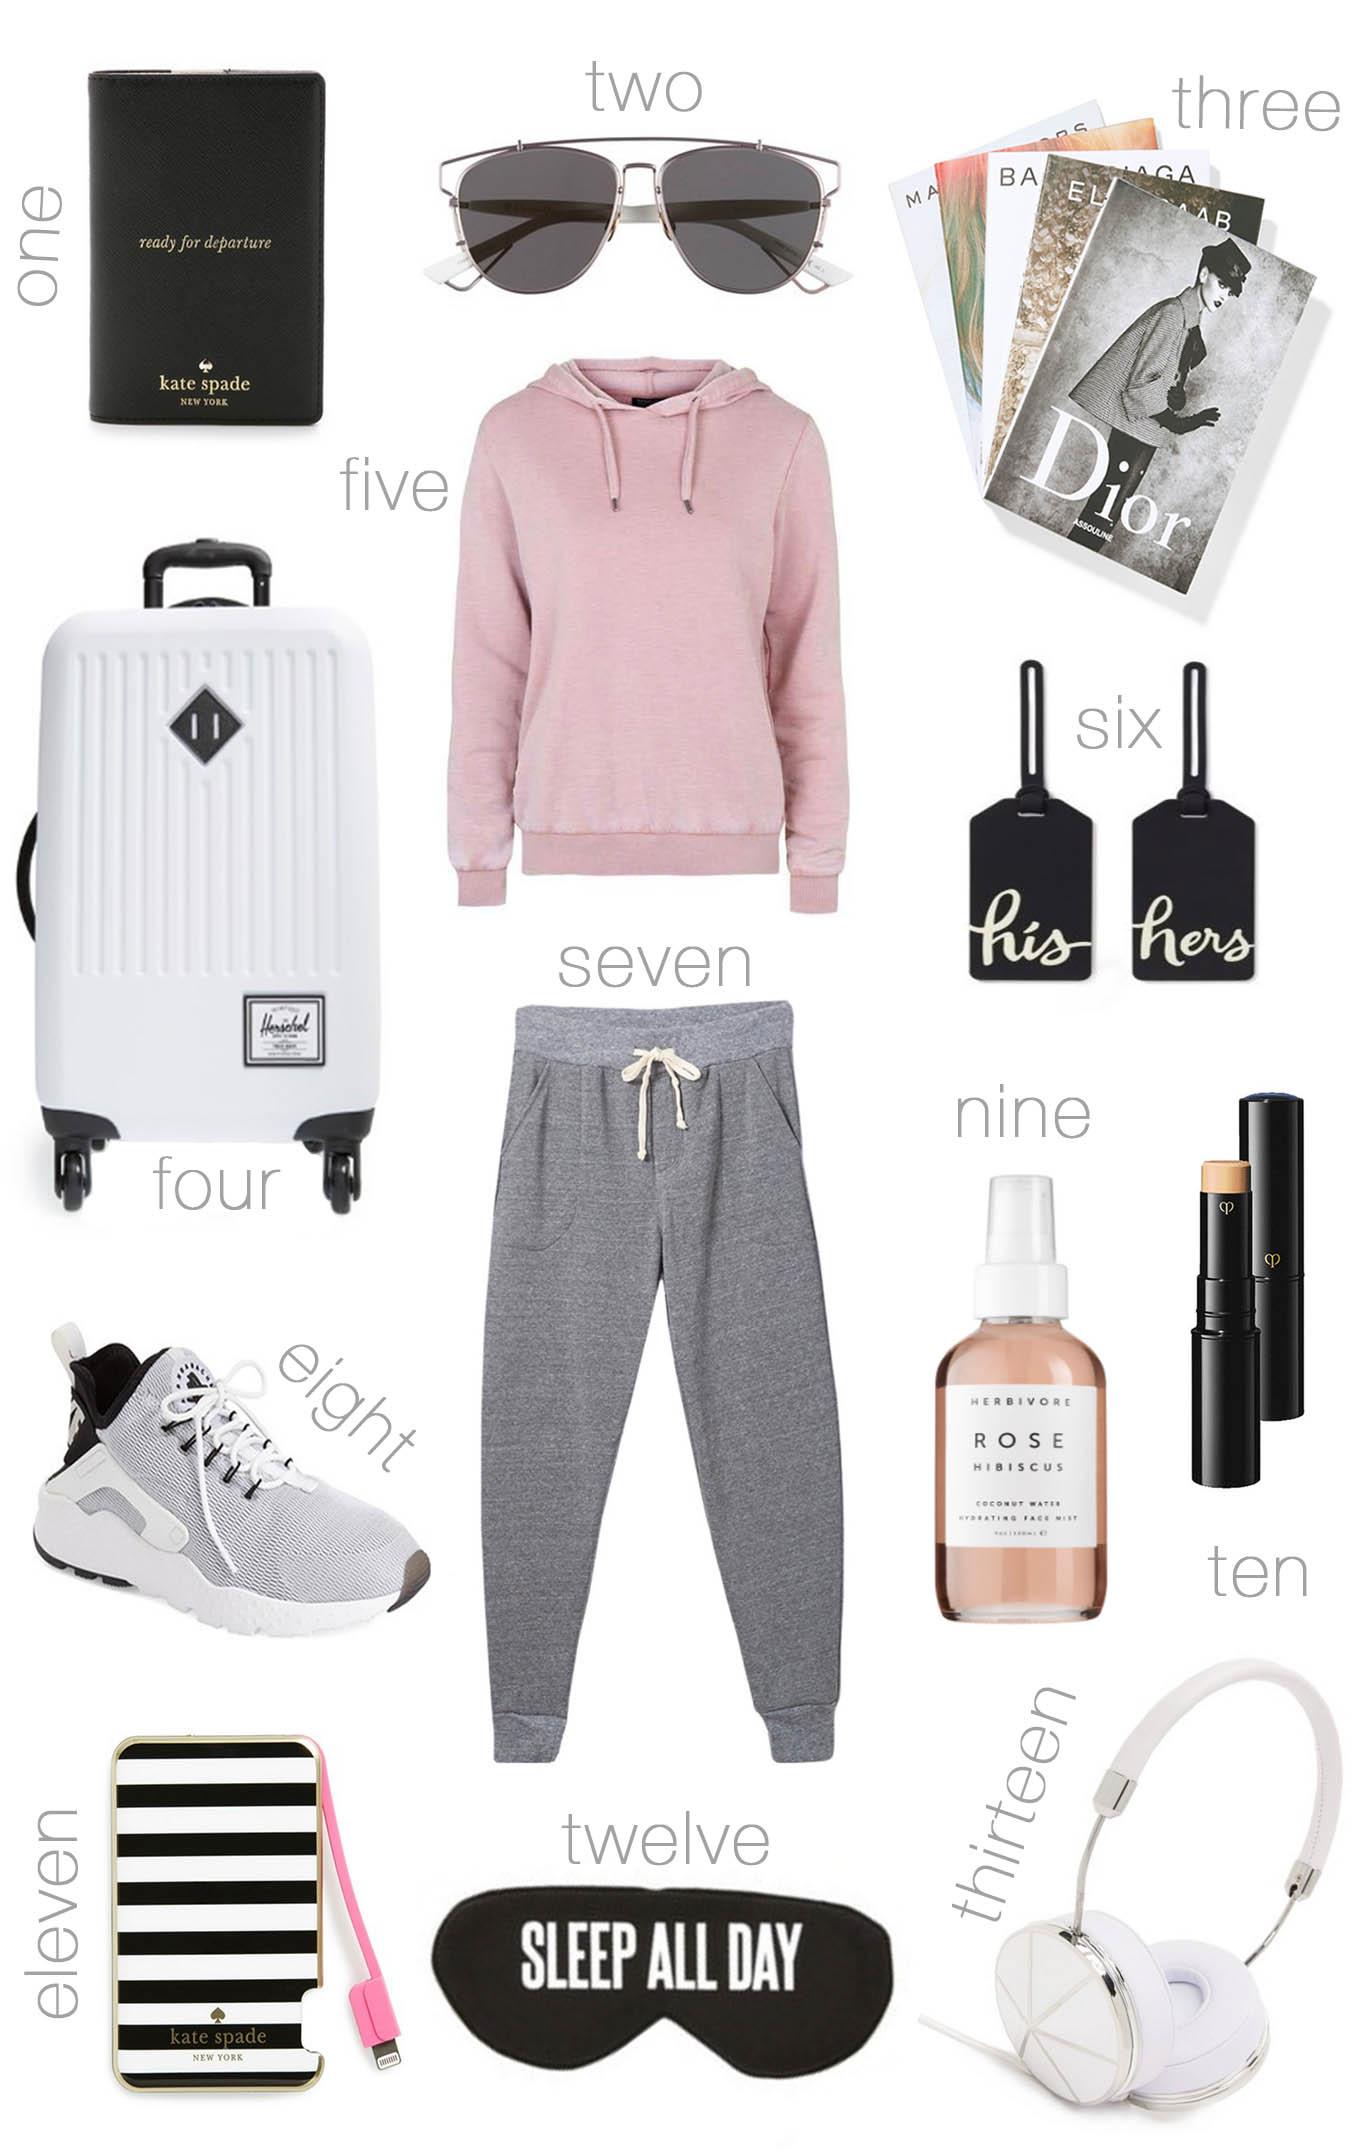 grayl-joggers-pants-pink-light-sweater-sweatshirt-hoodie-sun-white-shoe-sneakers-fall-winter-weekend.jpg